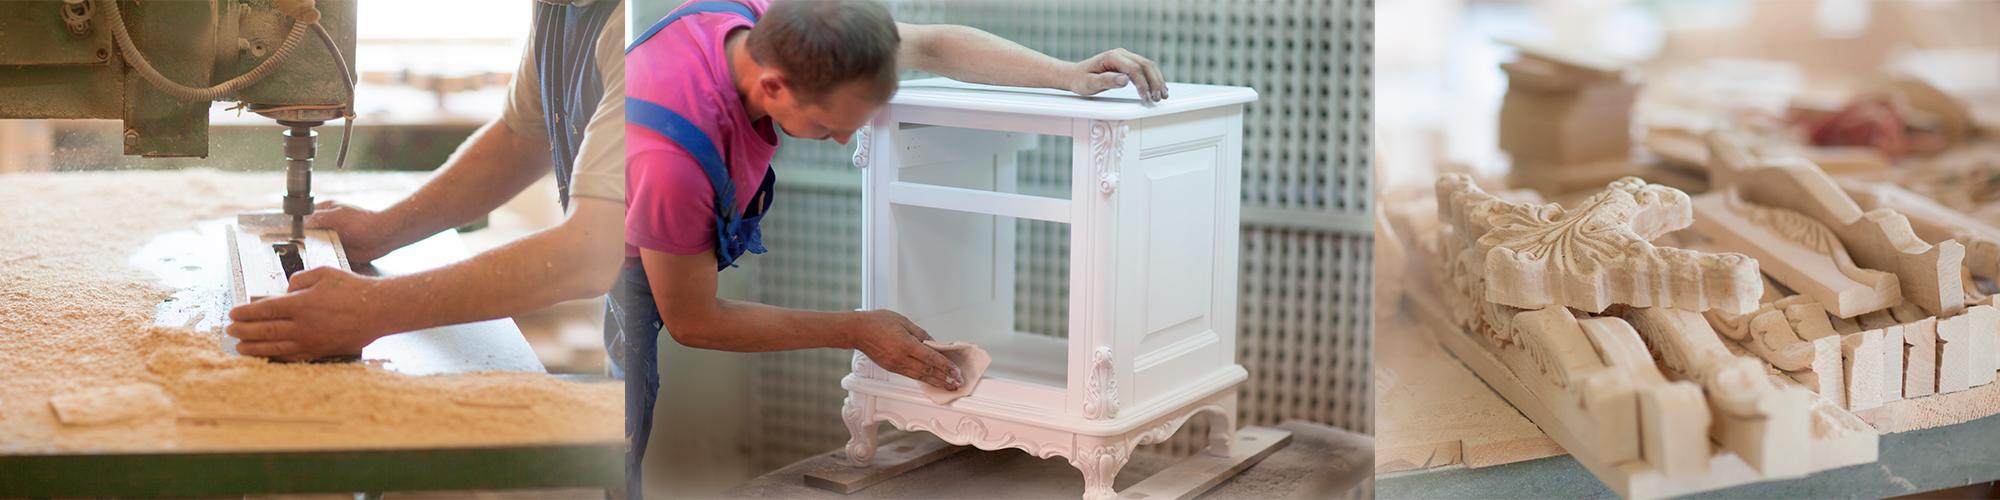 Мебельная фабрика Курьер